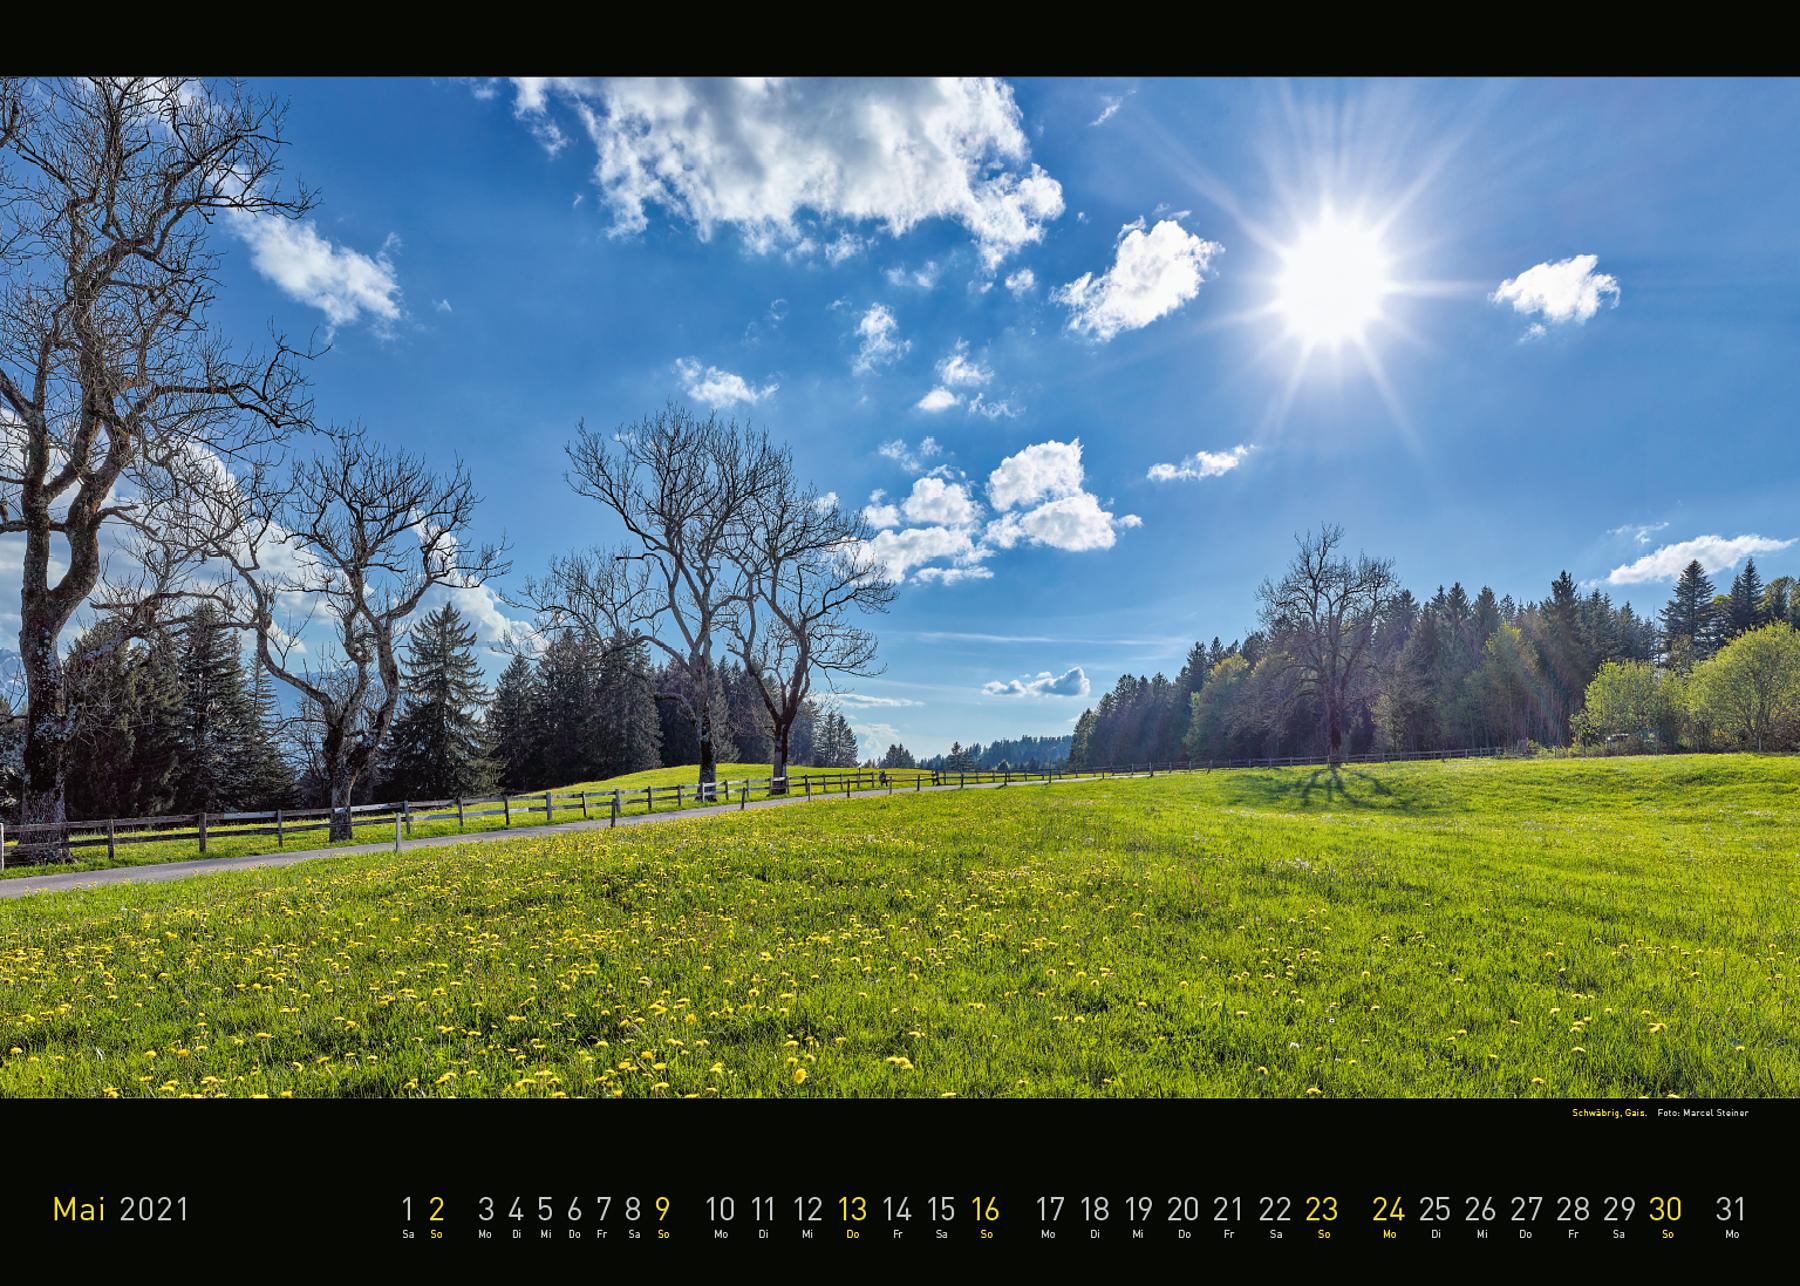 Panorama Appenzellerland 2021 Mai